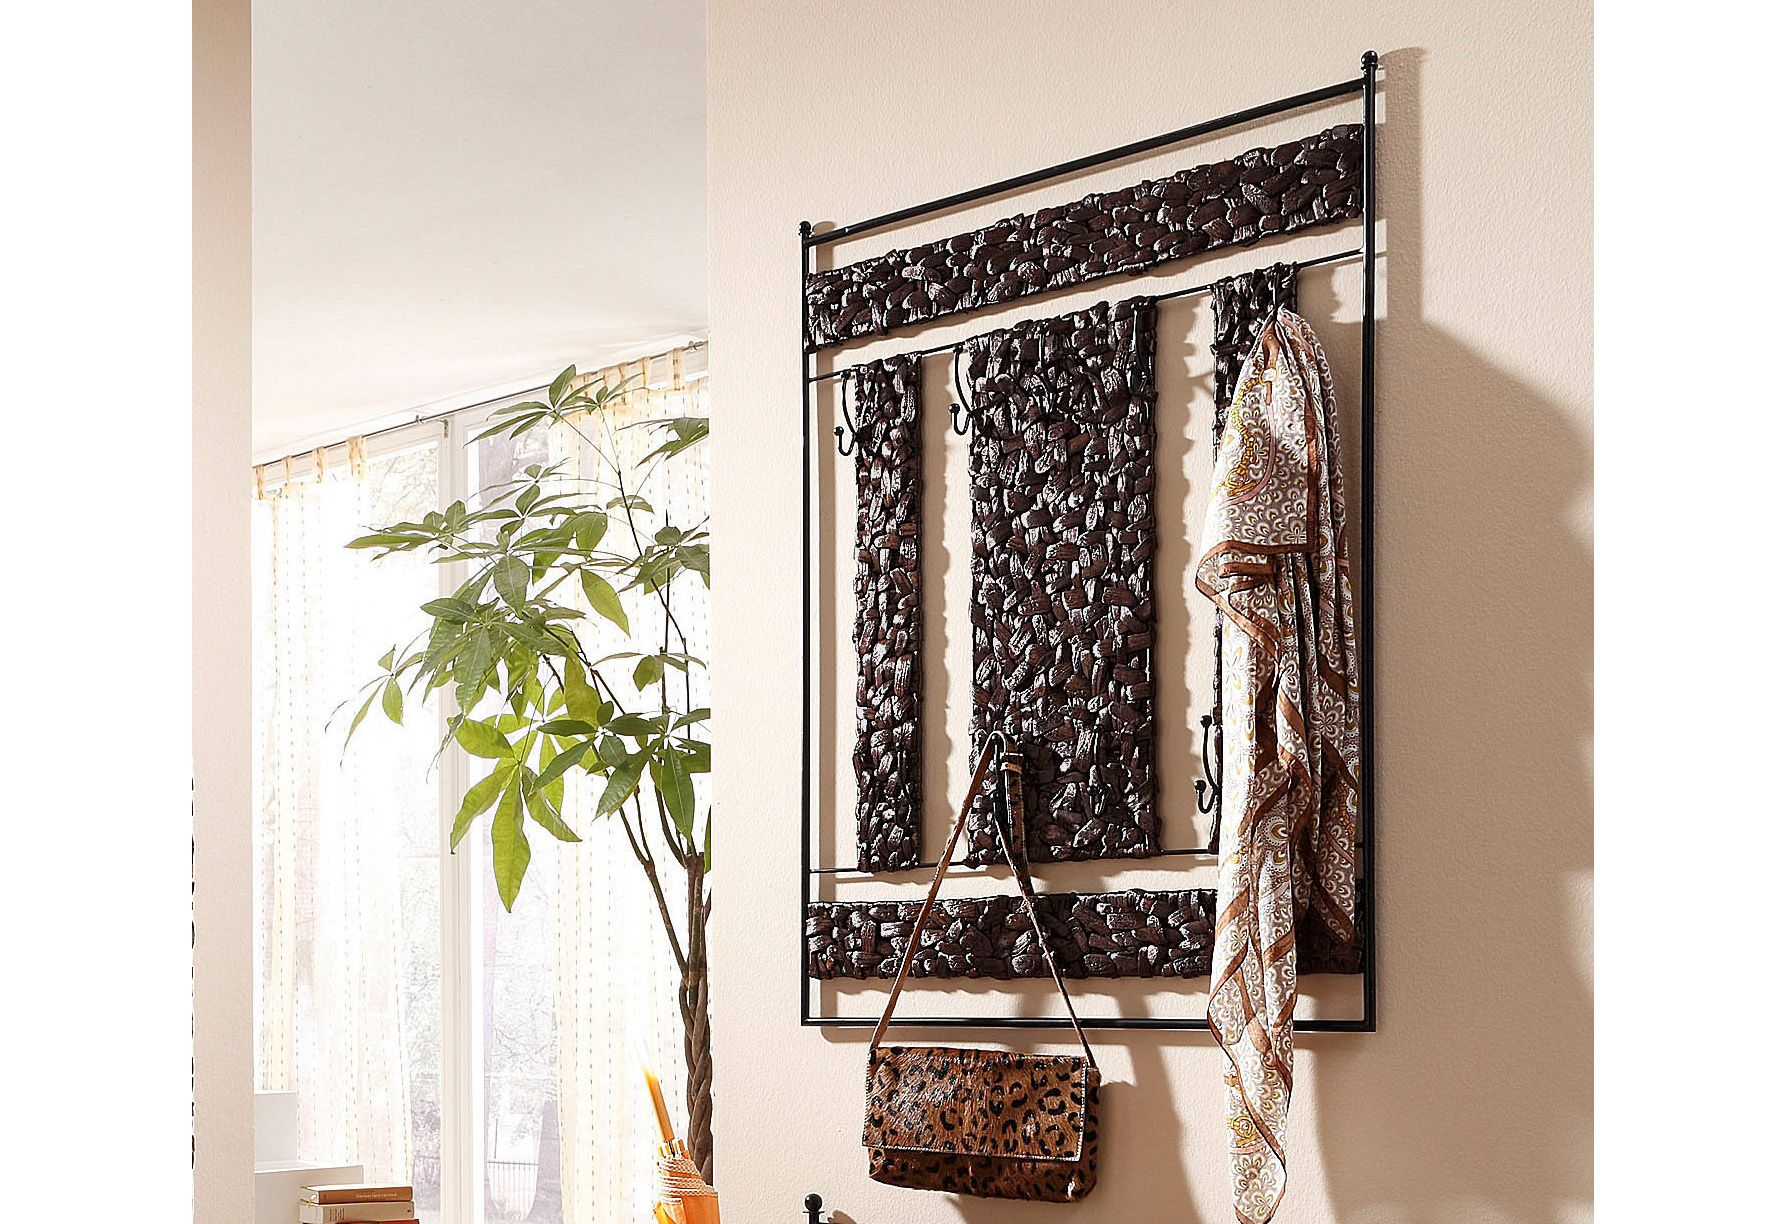 rustikale garderobe g nstig kaufen. Black Bedroom Furniture Sets. Home Design Ideas